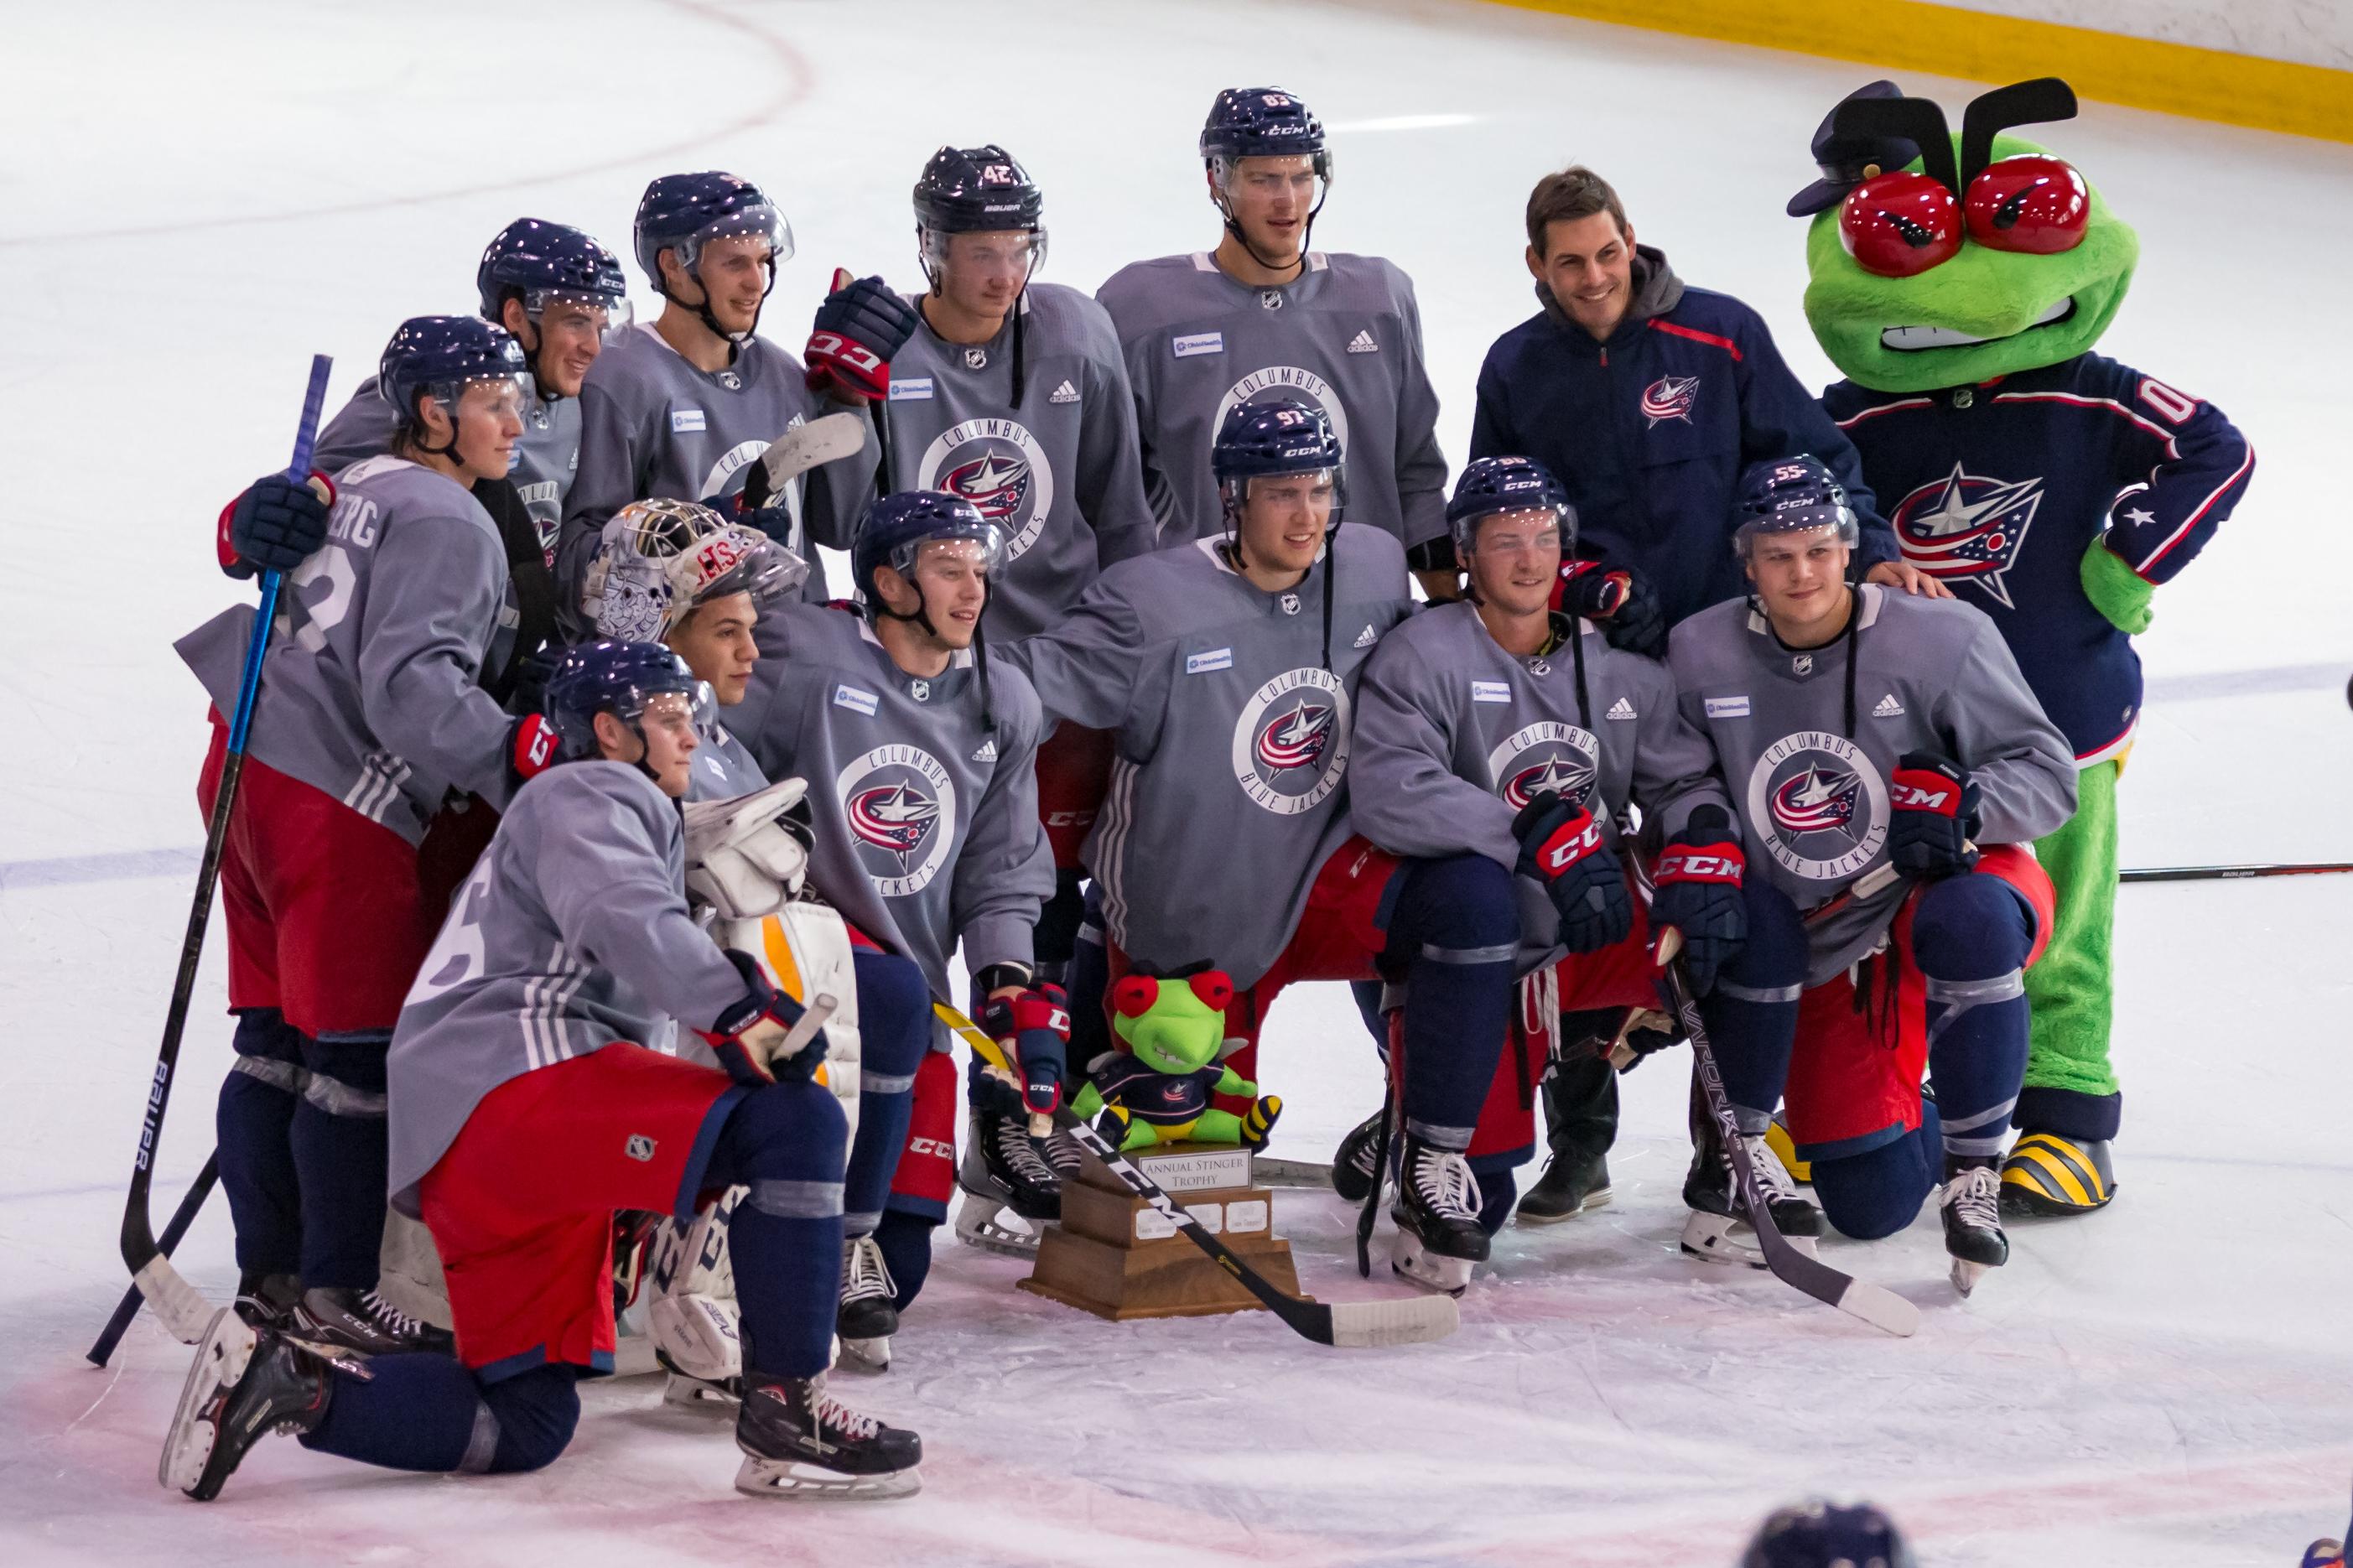 NHL: JUN 28 Columbus Blue Jackets Development Camp